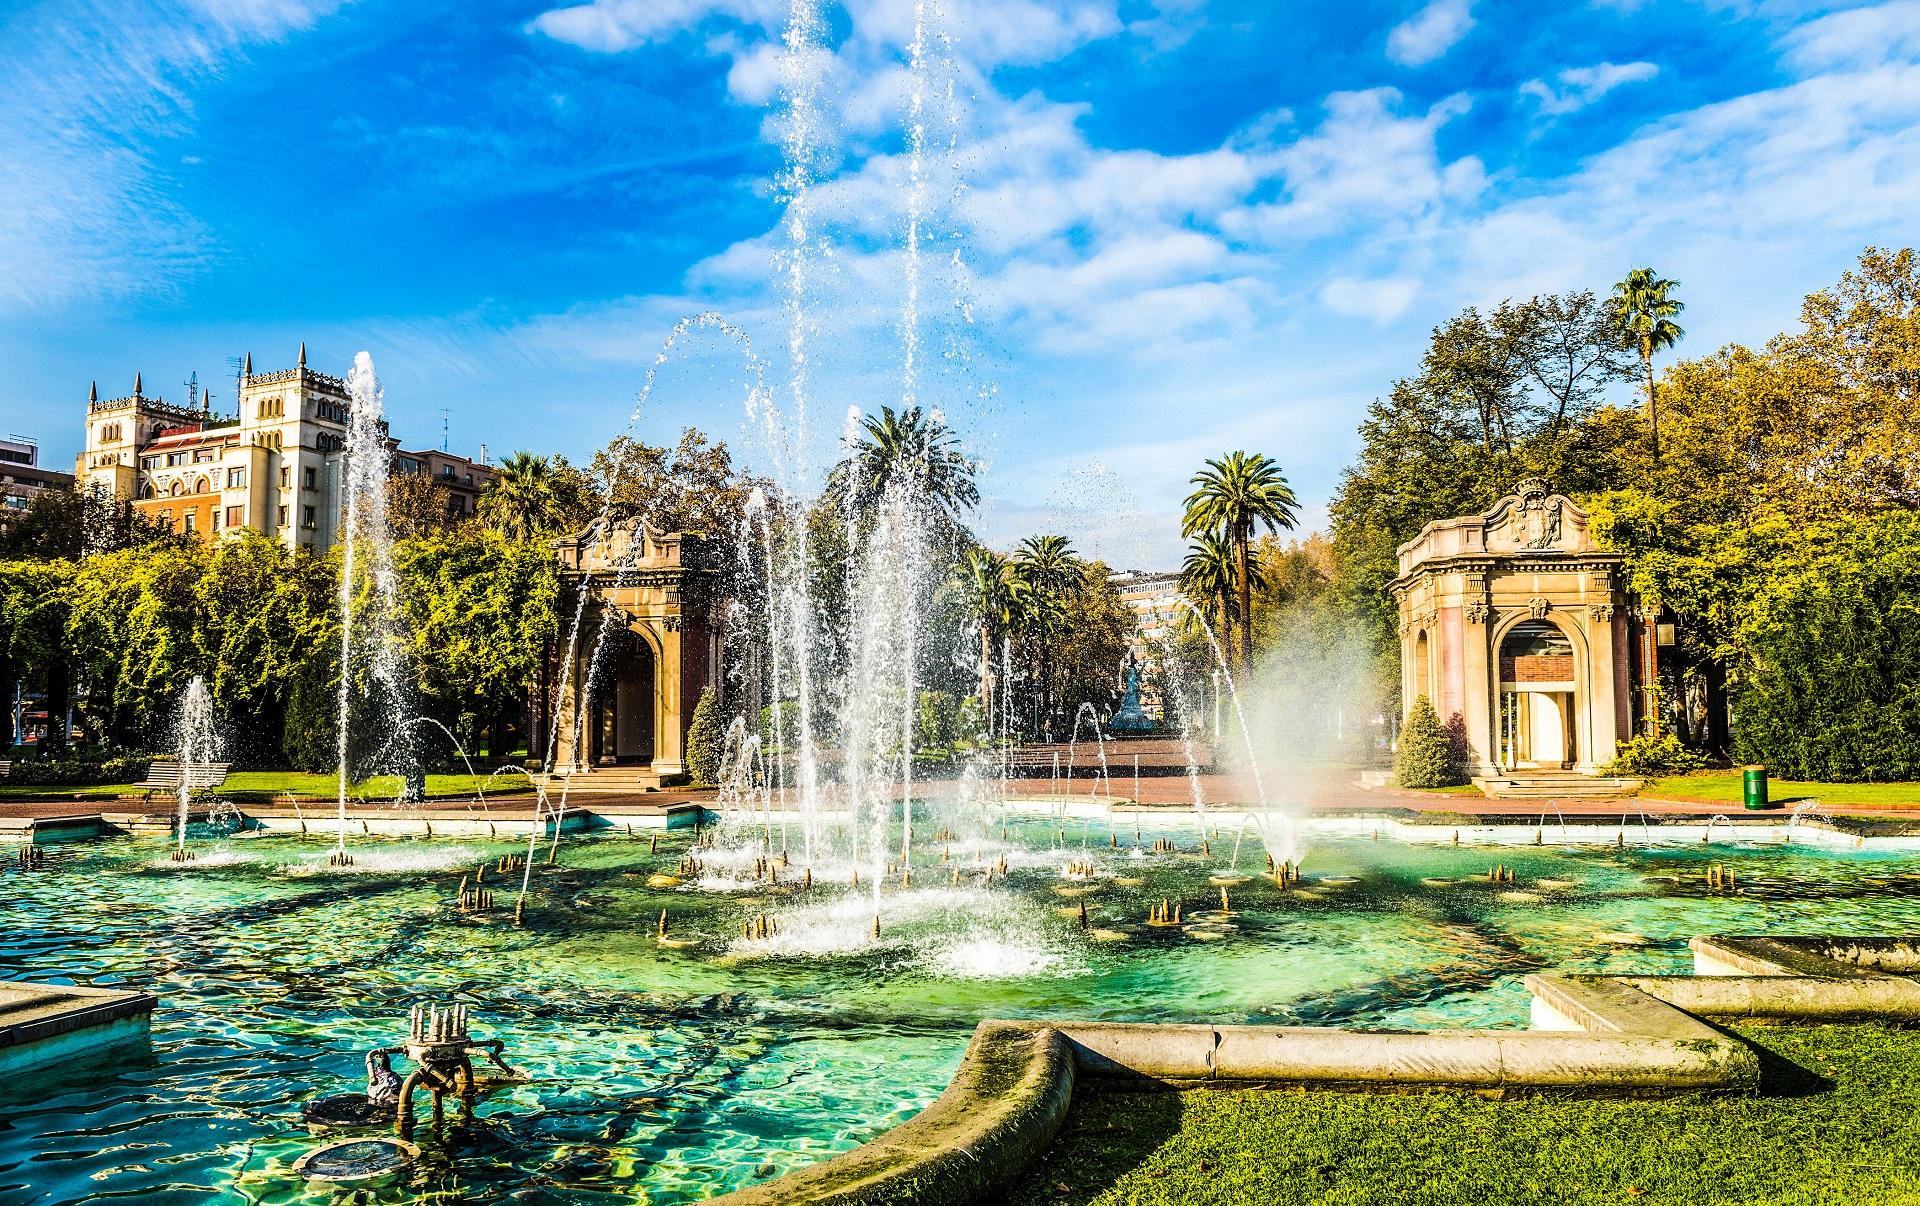 Entdeckt bilbao spaniens bunte seite urlaubsguru for Hotel jardines de bilbao